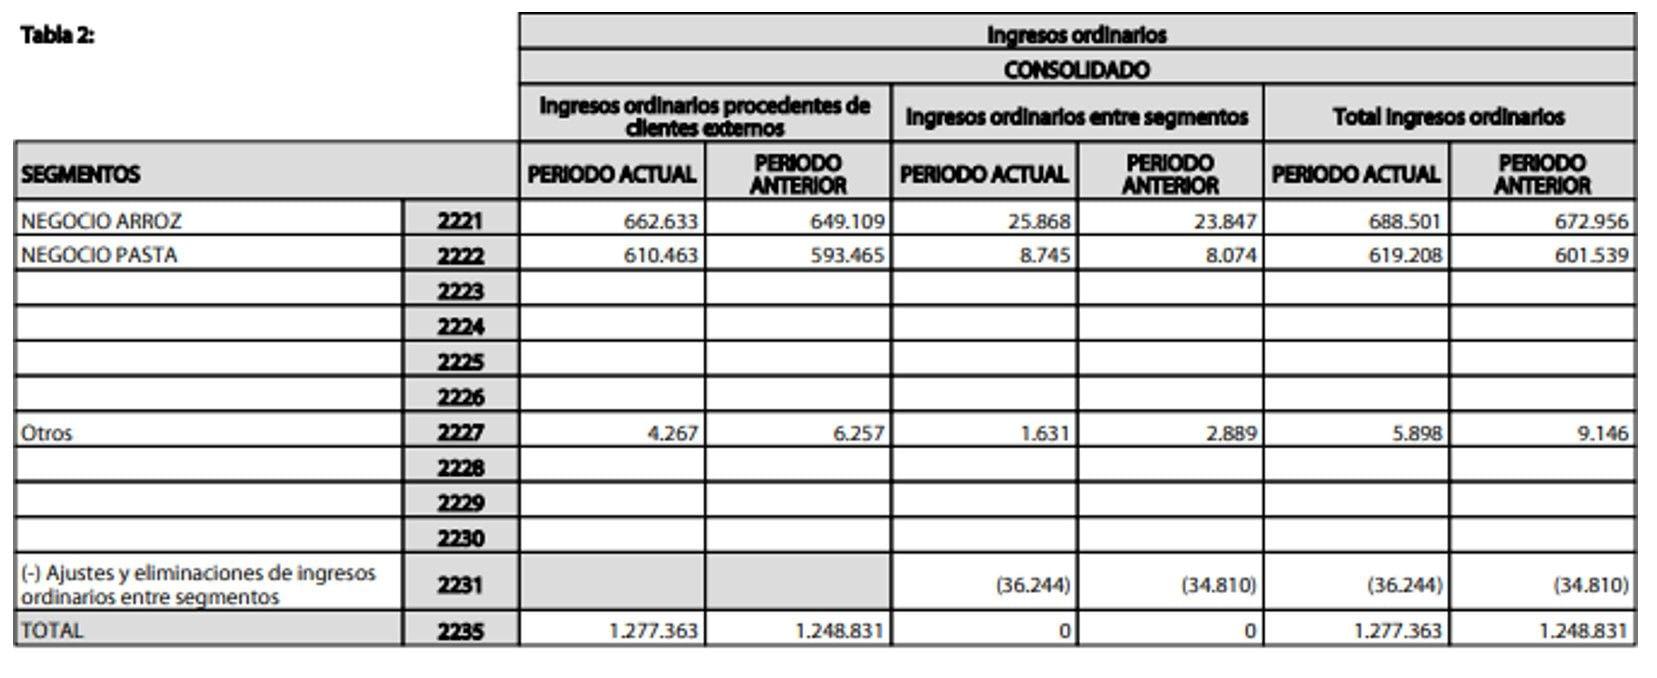 Ventas por Segmento Ebro Foods 1S 2018